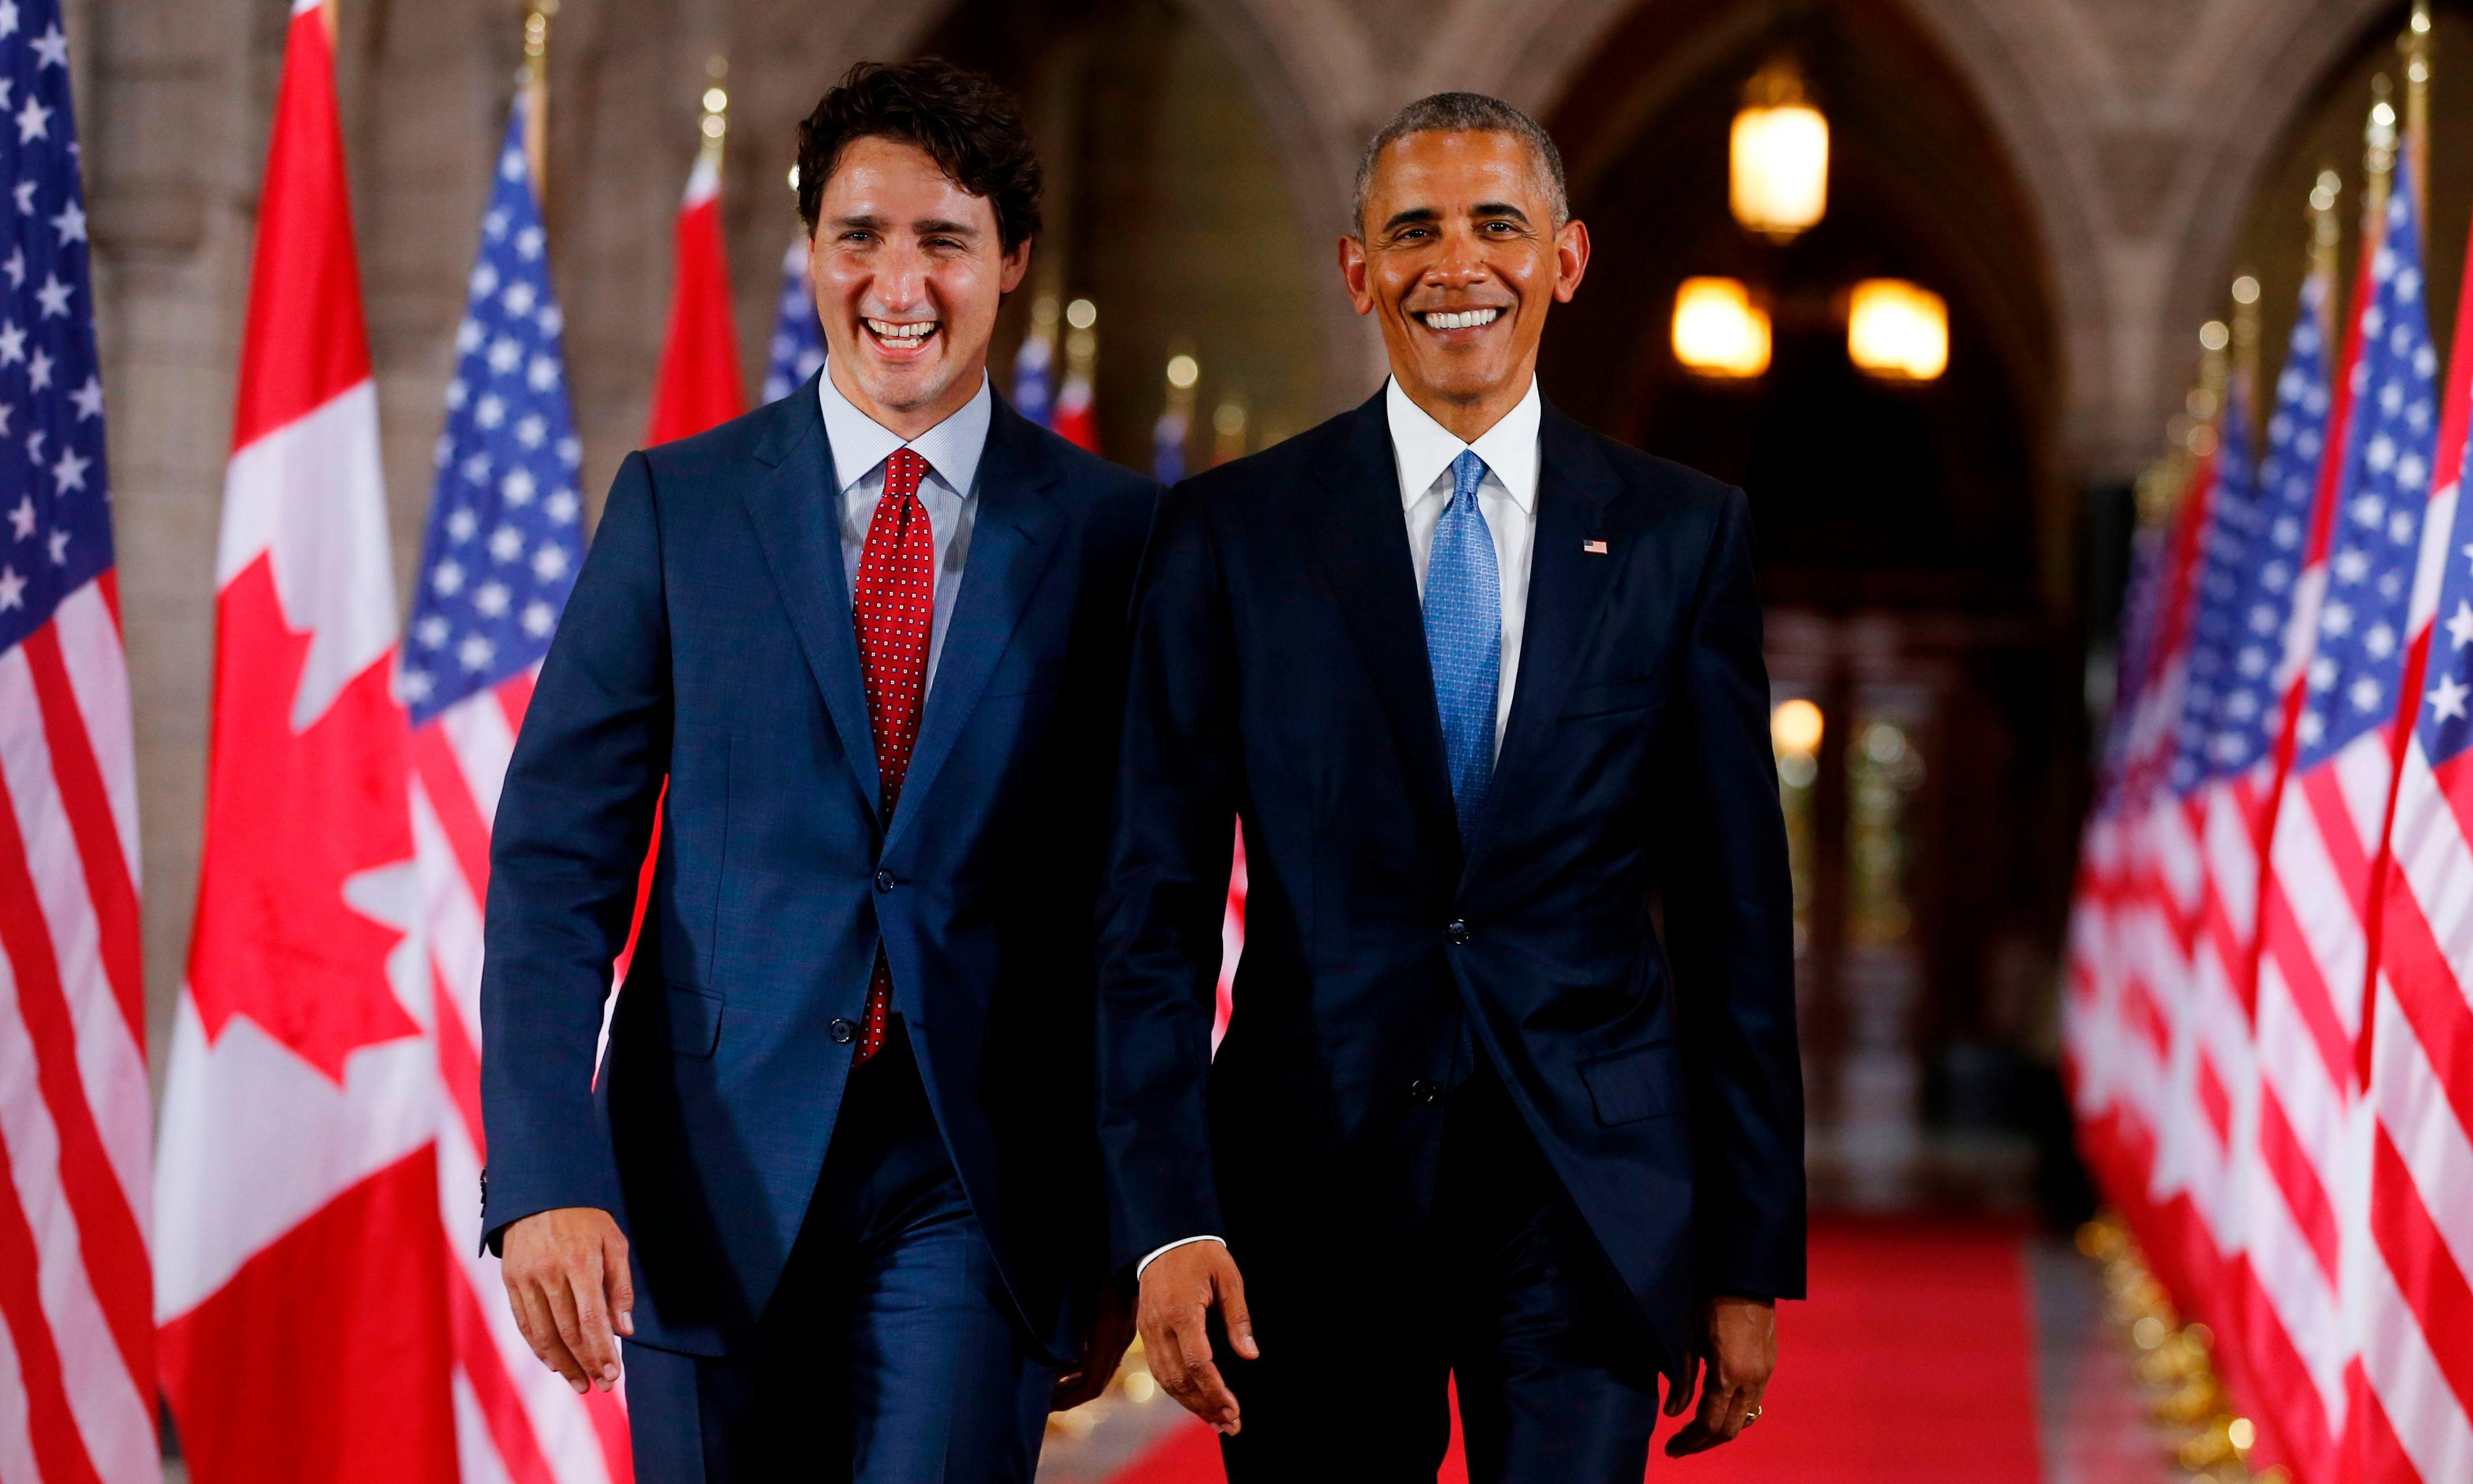 Obama endorses Trudeau: 'The world needs his progressive leadership'